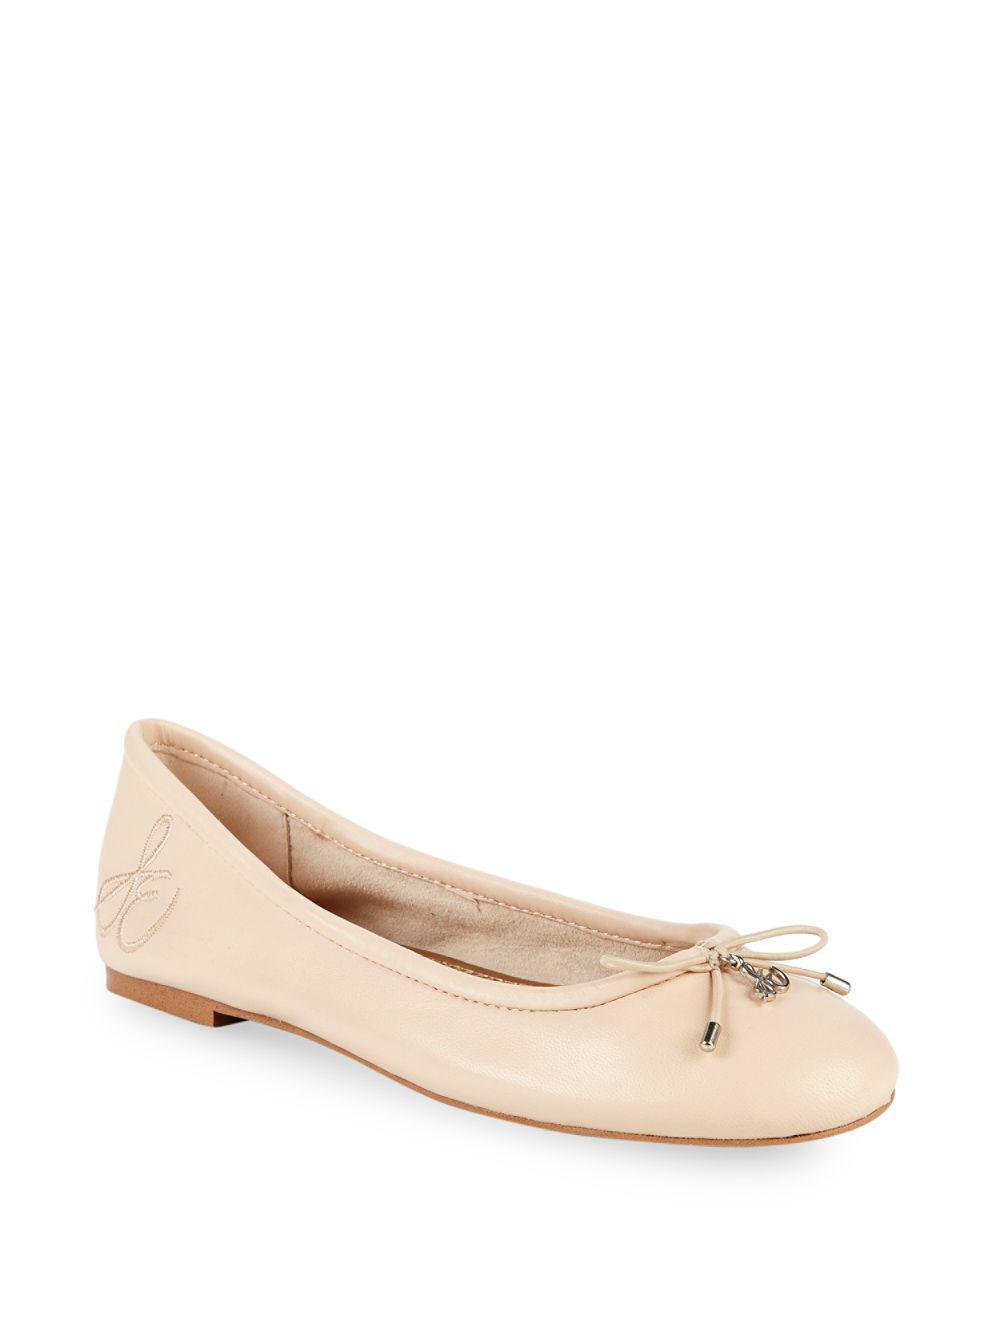 8b3bba8c9de9f Sam Edelman Felicia Leather Ballet Flats in Natural - Lyst